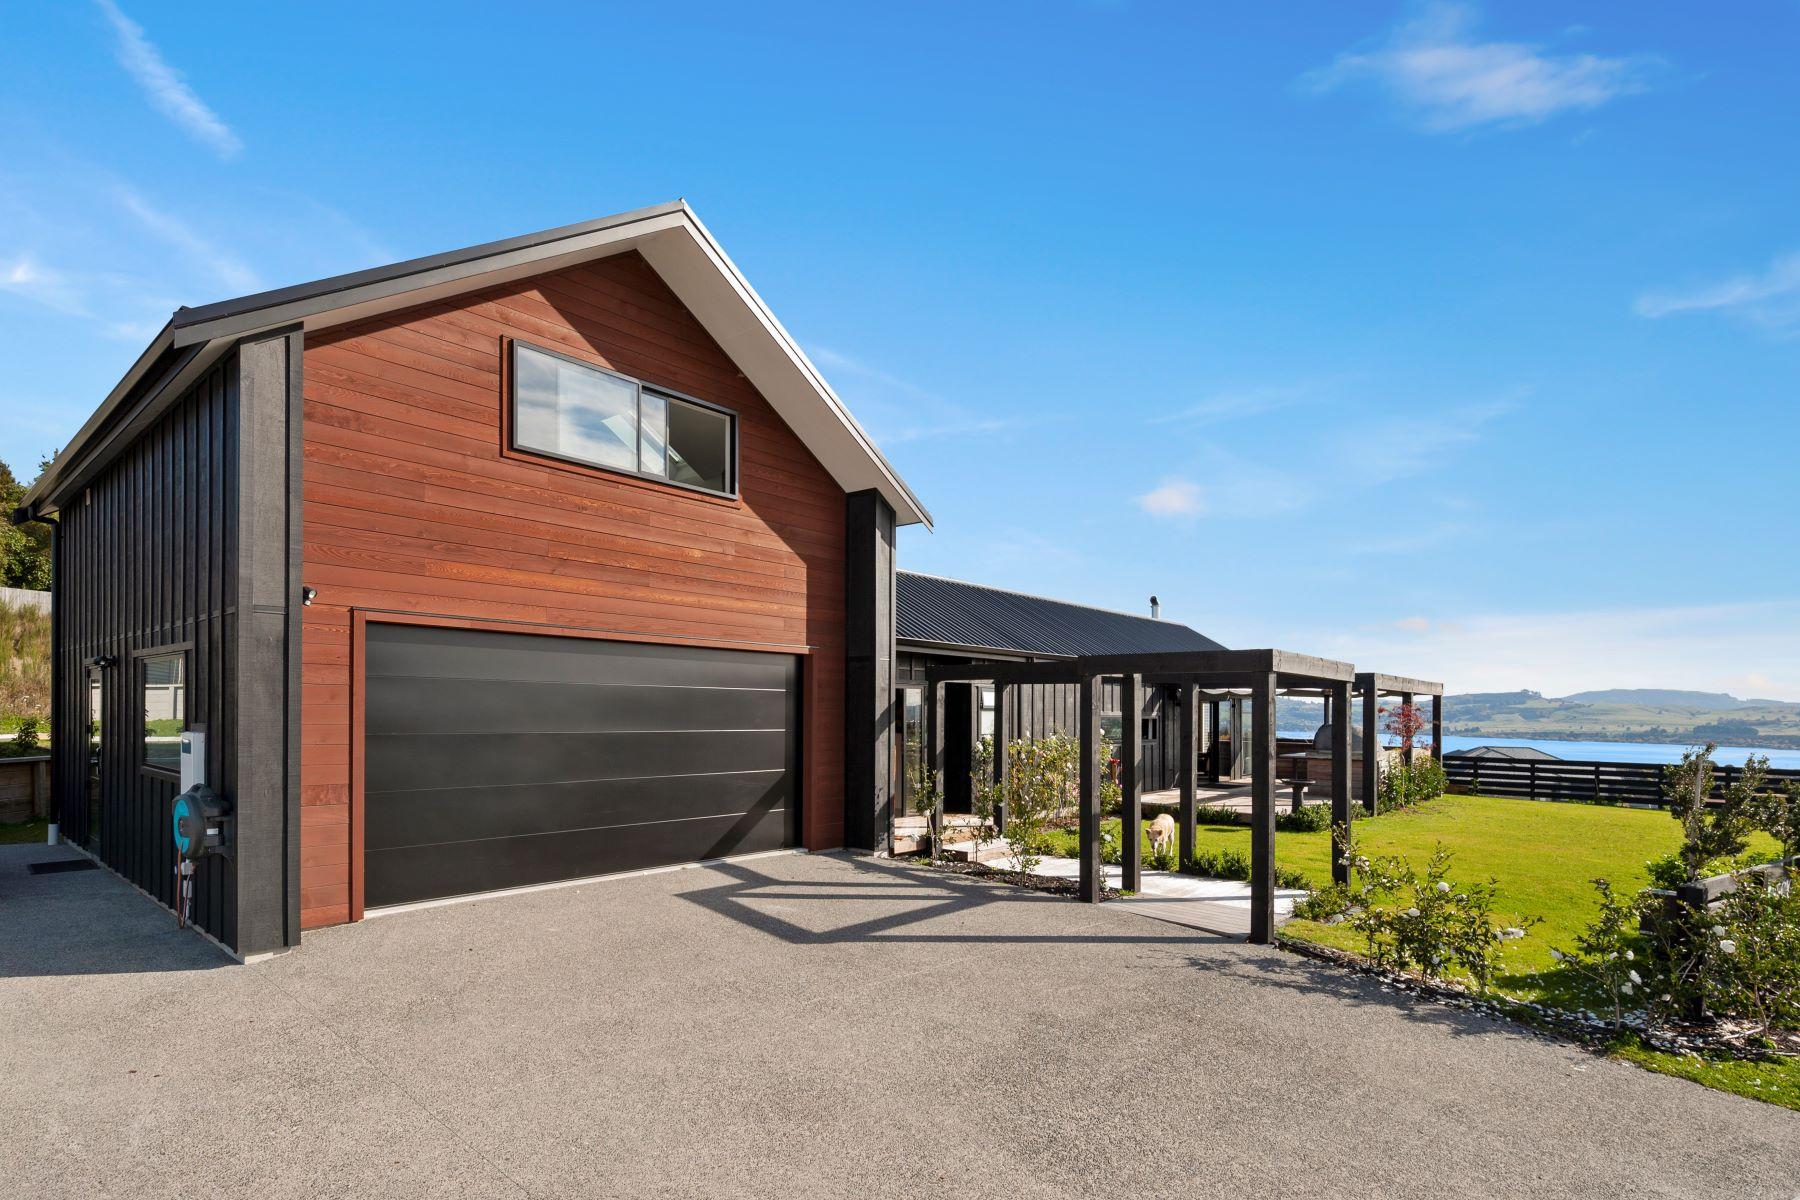 Single Family Homes for Sale at 42 Botanical Heights Drive, Waipahihi, Taupo 42 Botanical Heights Drive Taupo, Waikato 3330 New Zealand